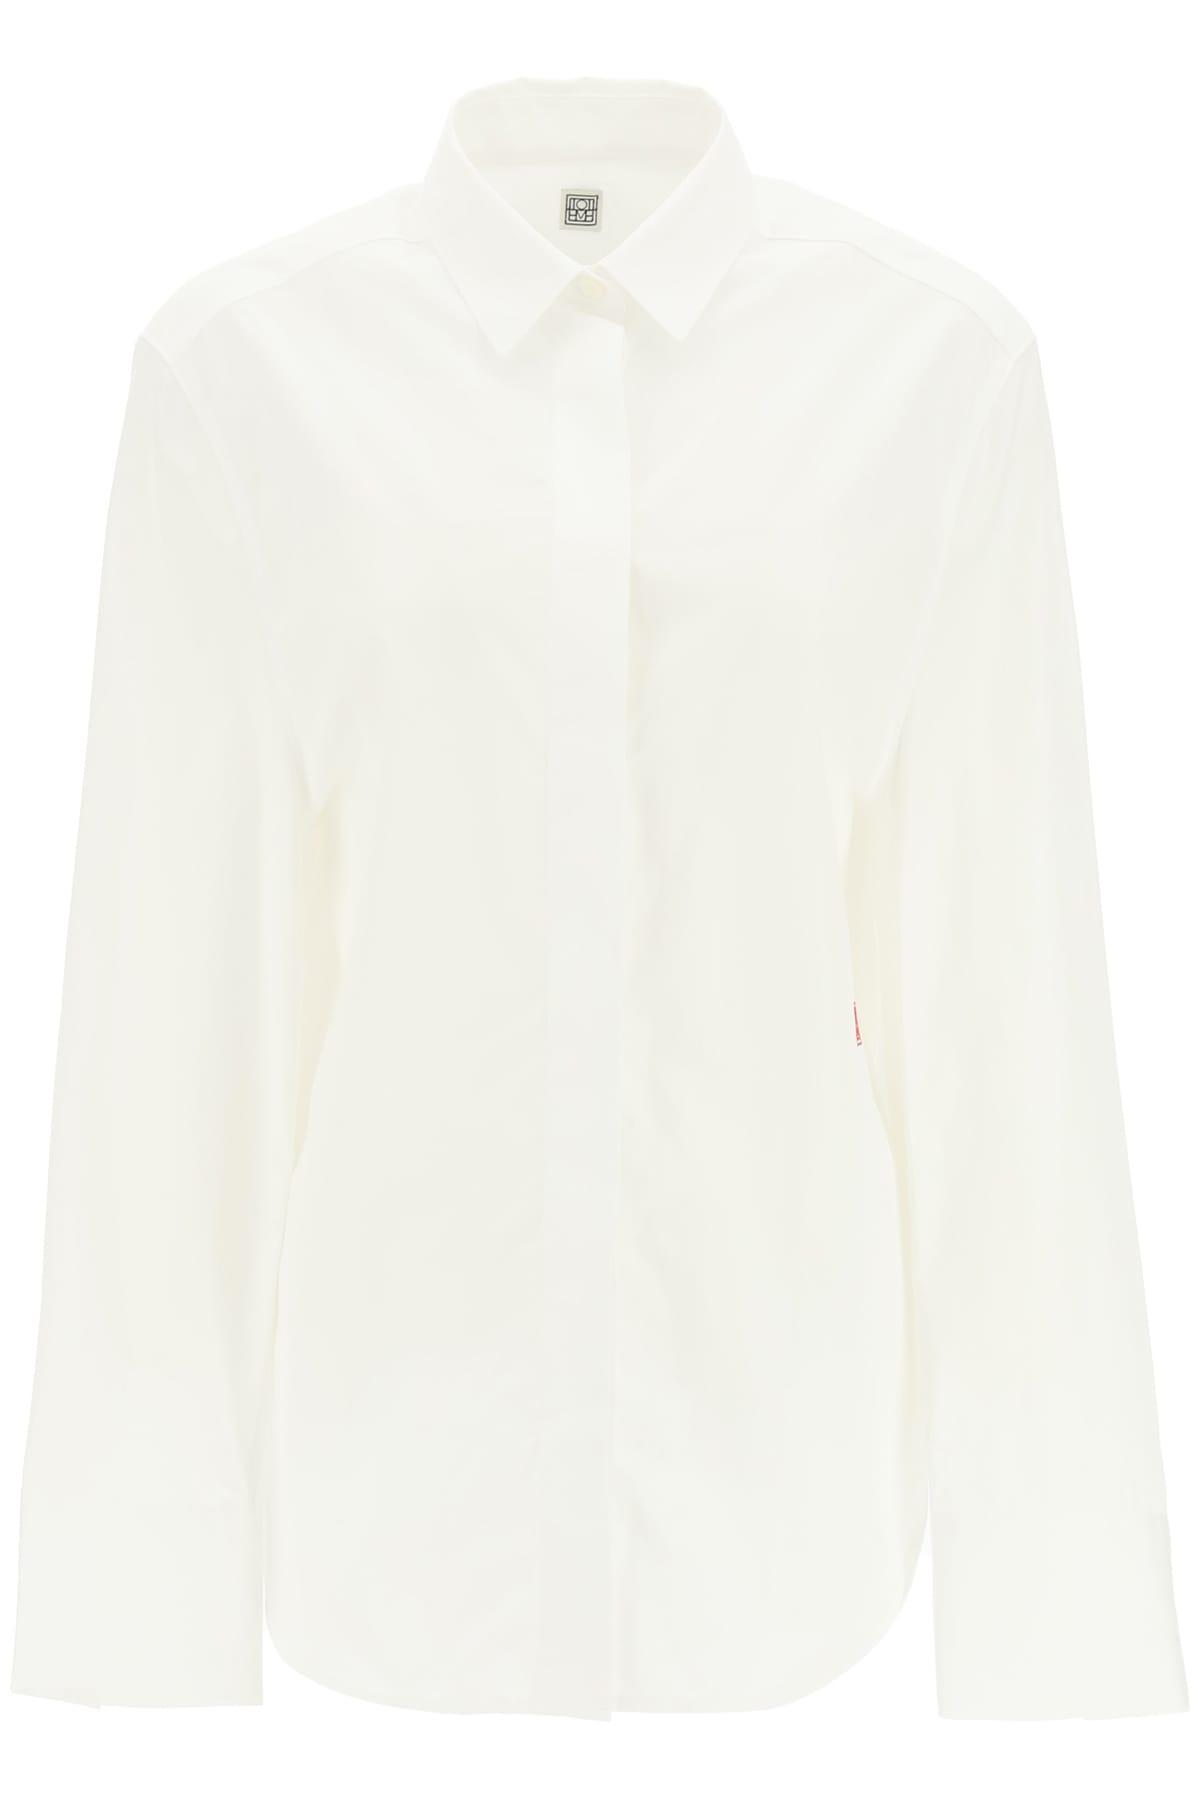 Totême Oversized Poplin Shirt